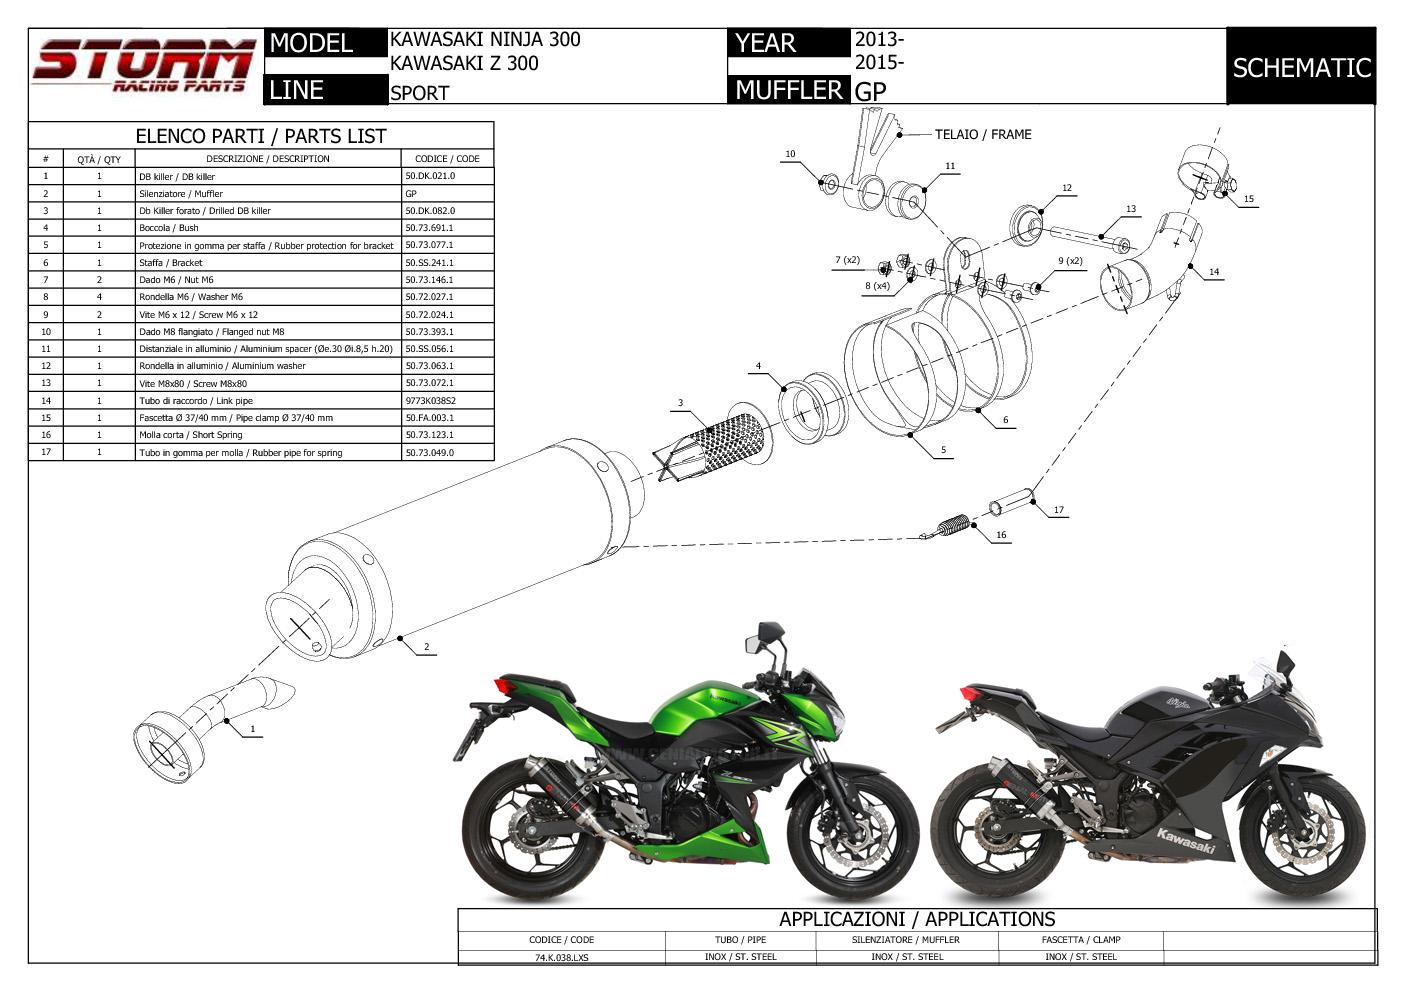 Exhaust Storm By Mivv Muffler Gp Nero Steel For Kawasaki